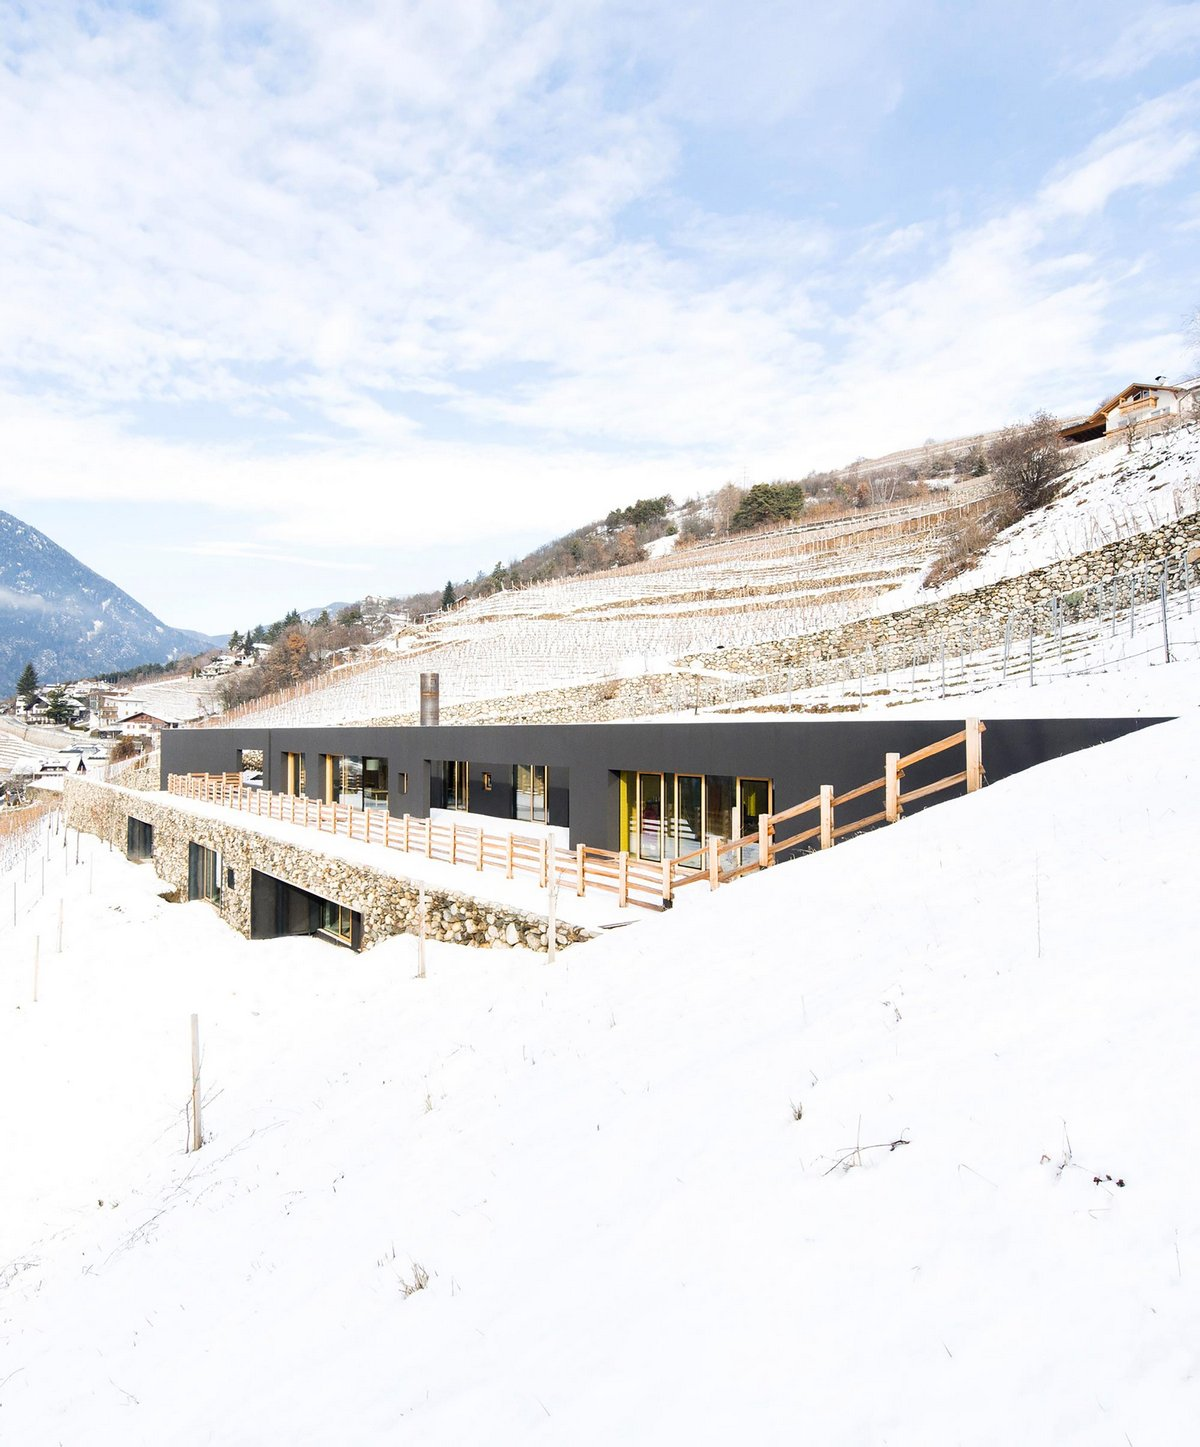 Bergmeister Wolf Architekten, дом виноградаря, вилла виноградник, виллы в италии, виллы италии фото, дома на склонах гор фото